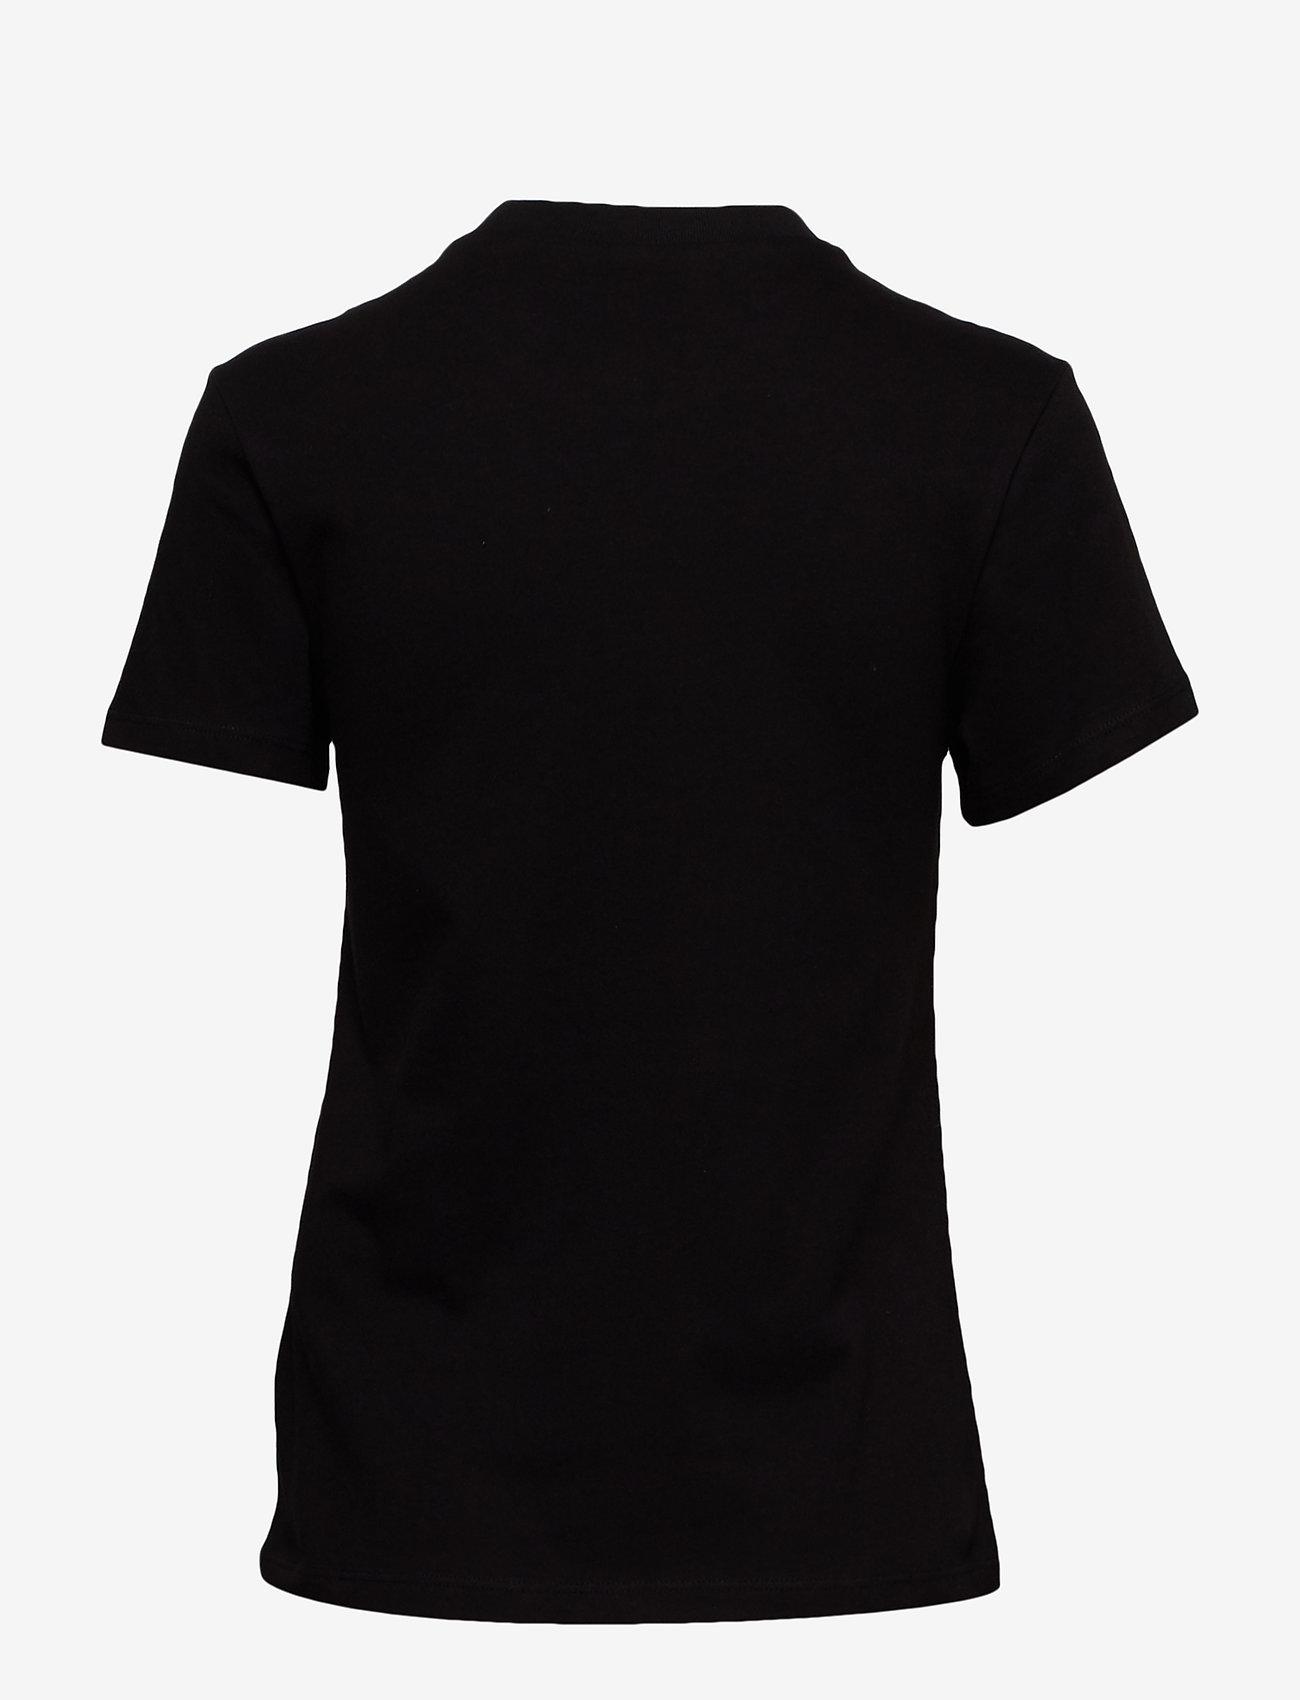 VANS - FLYING V CREW TEE - t-shirts - black - 1